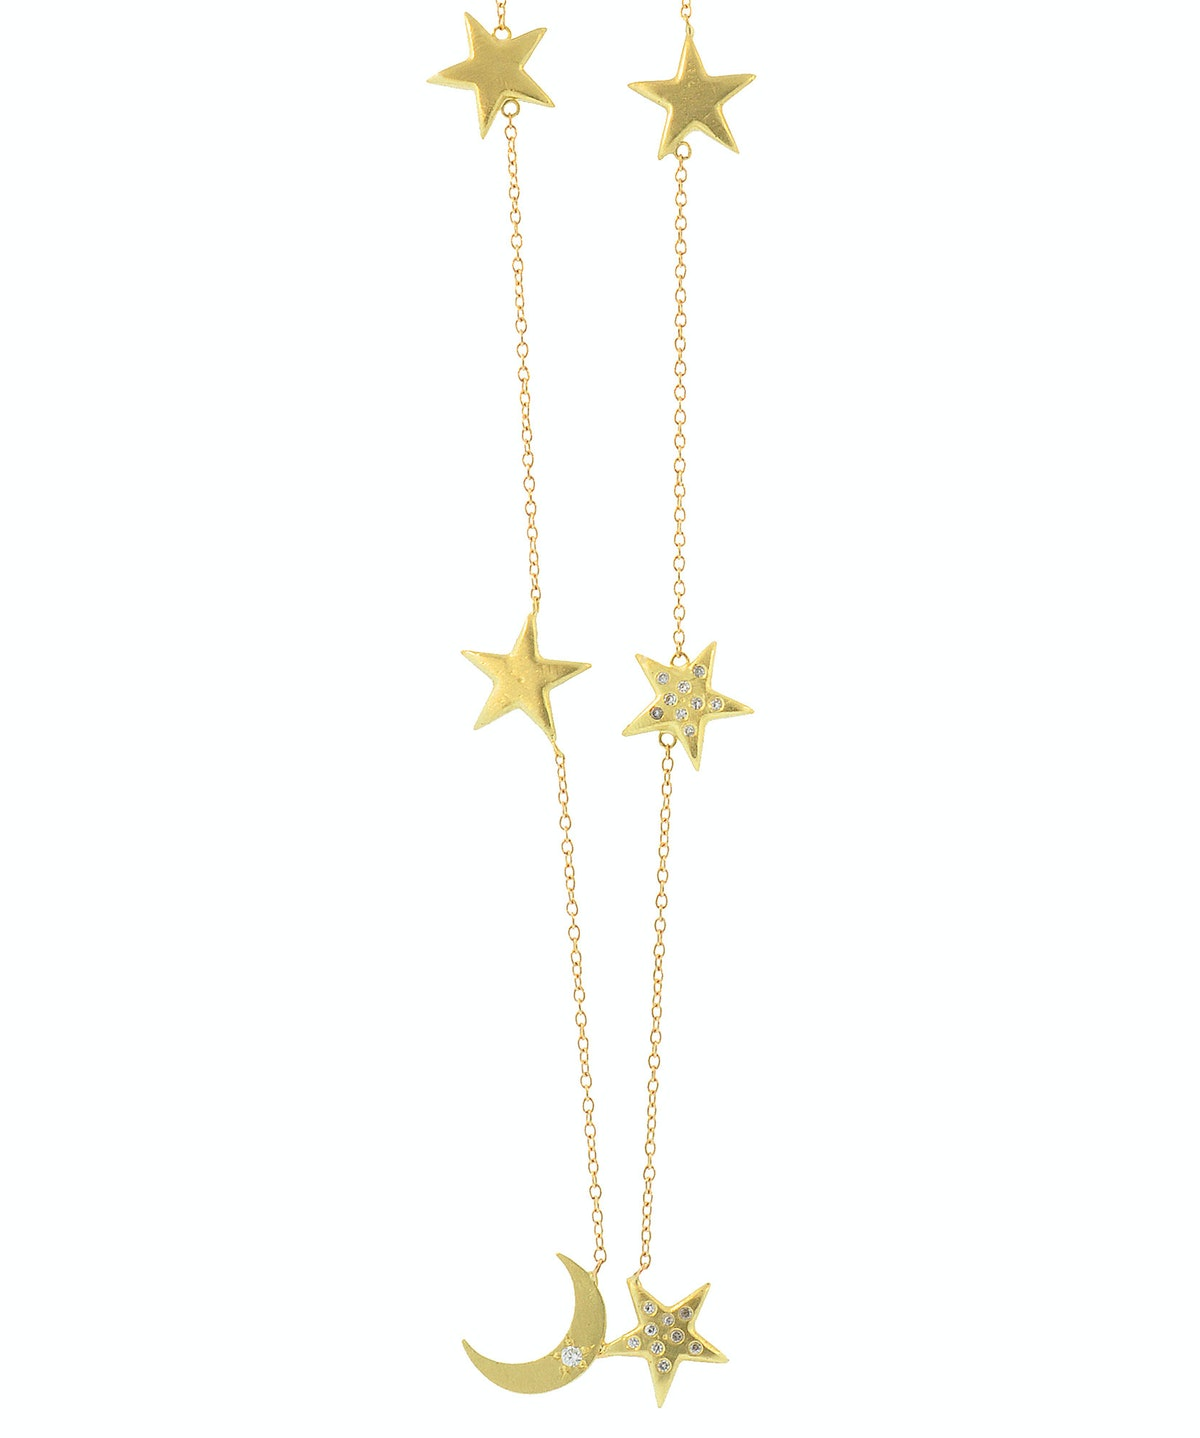 Andrea Fohrman 18k gold moon & stars necklace with white diamonds